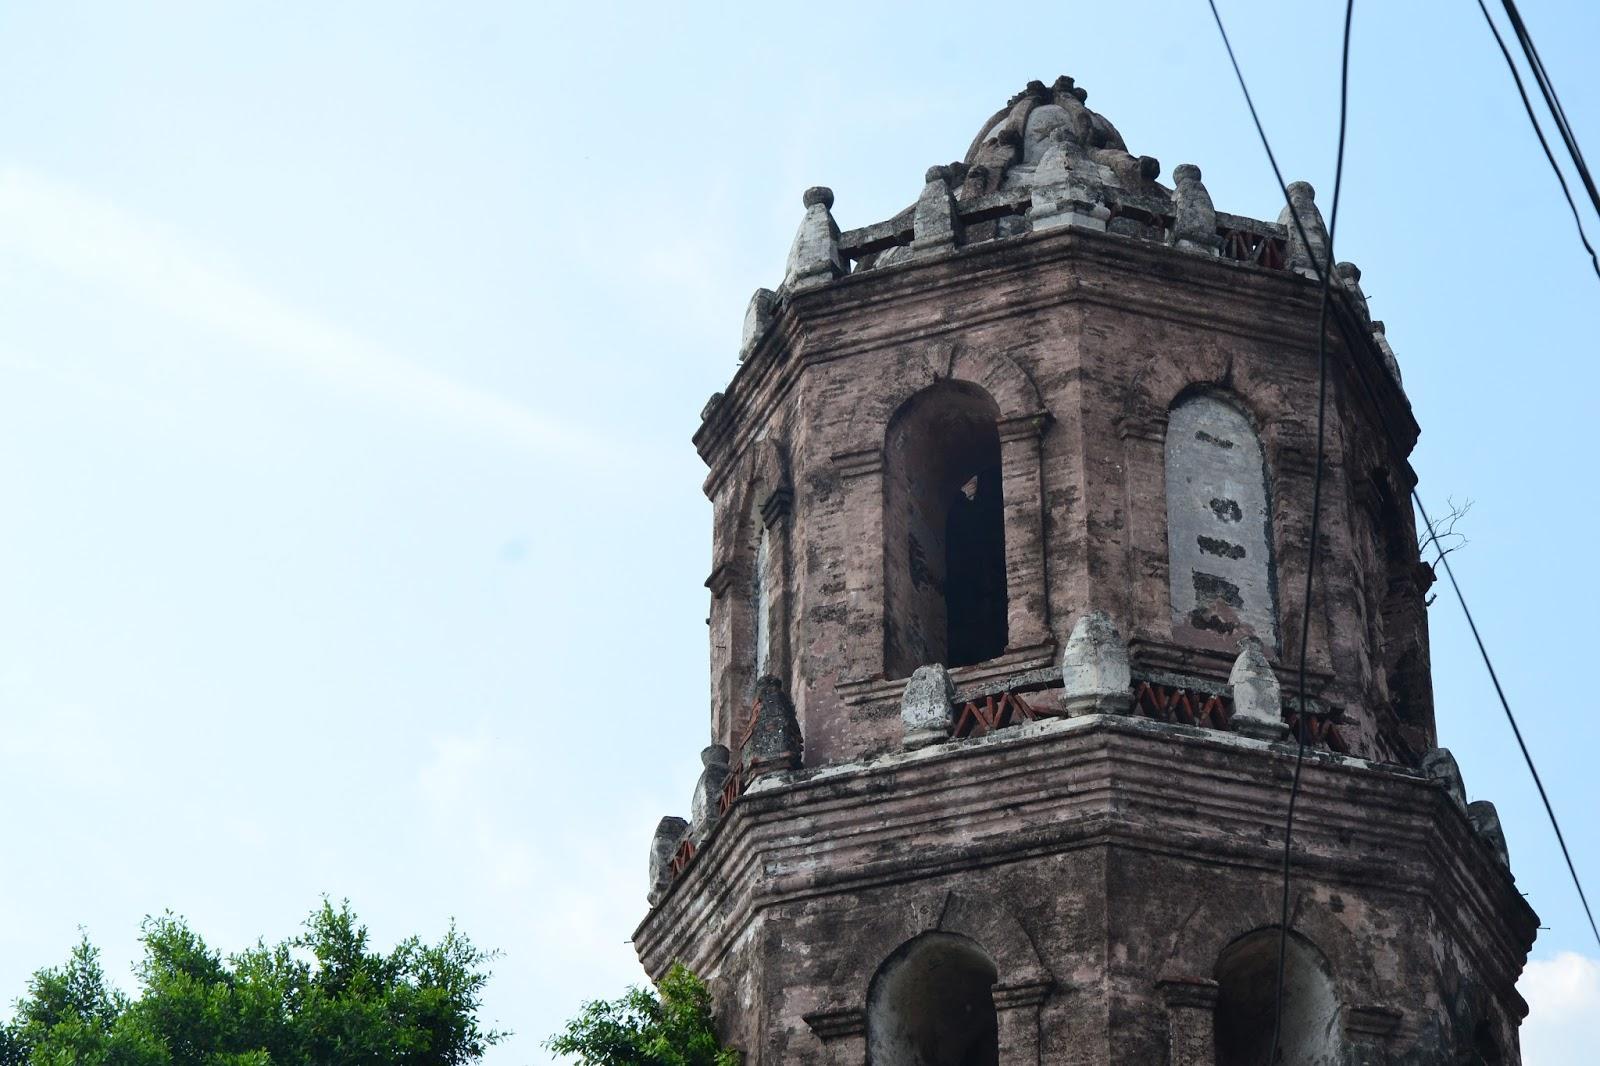 Belfry Of Recoletos Church